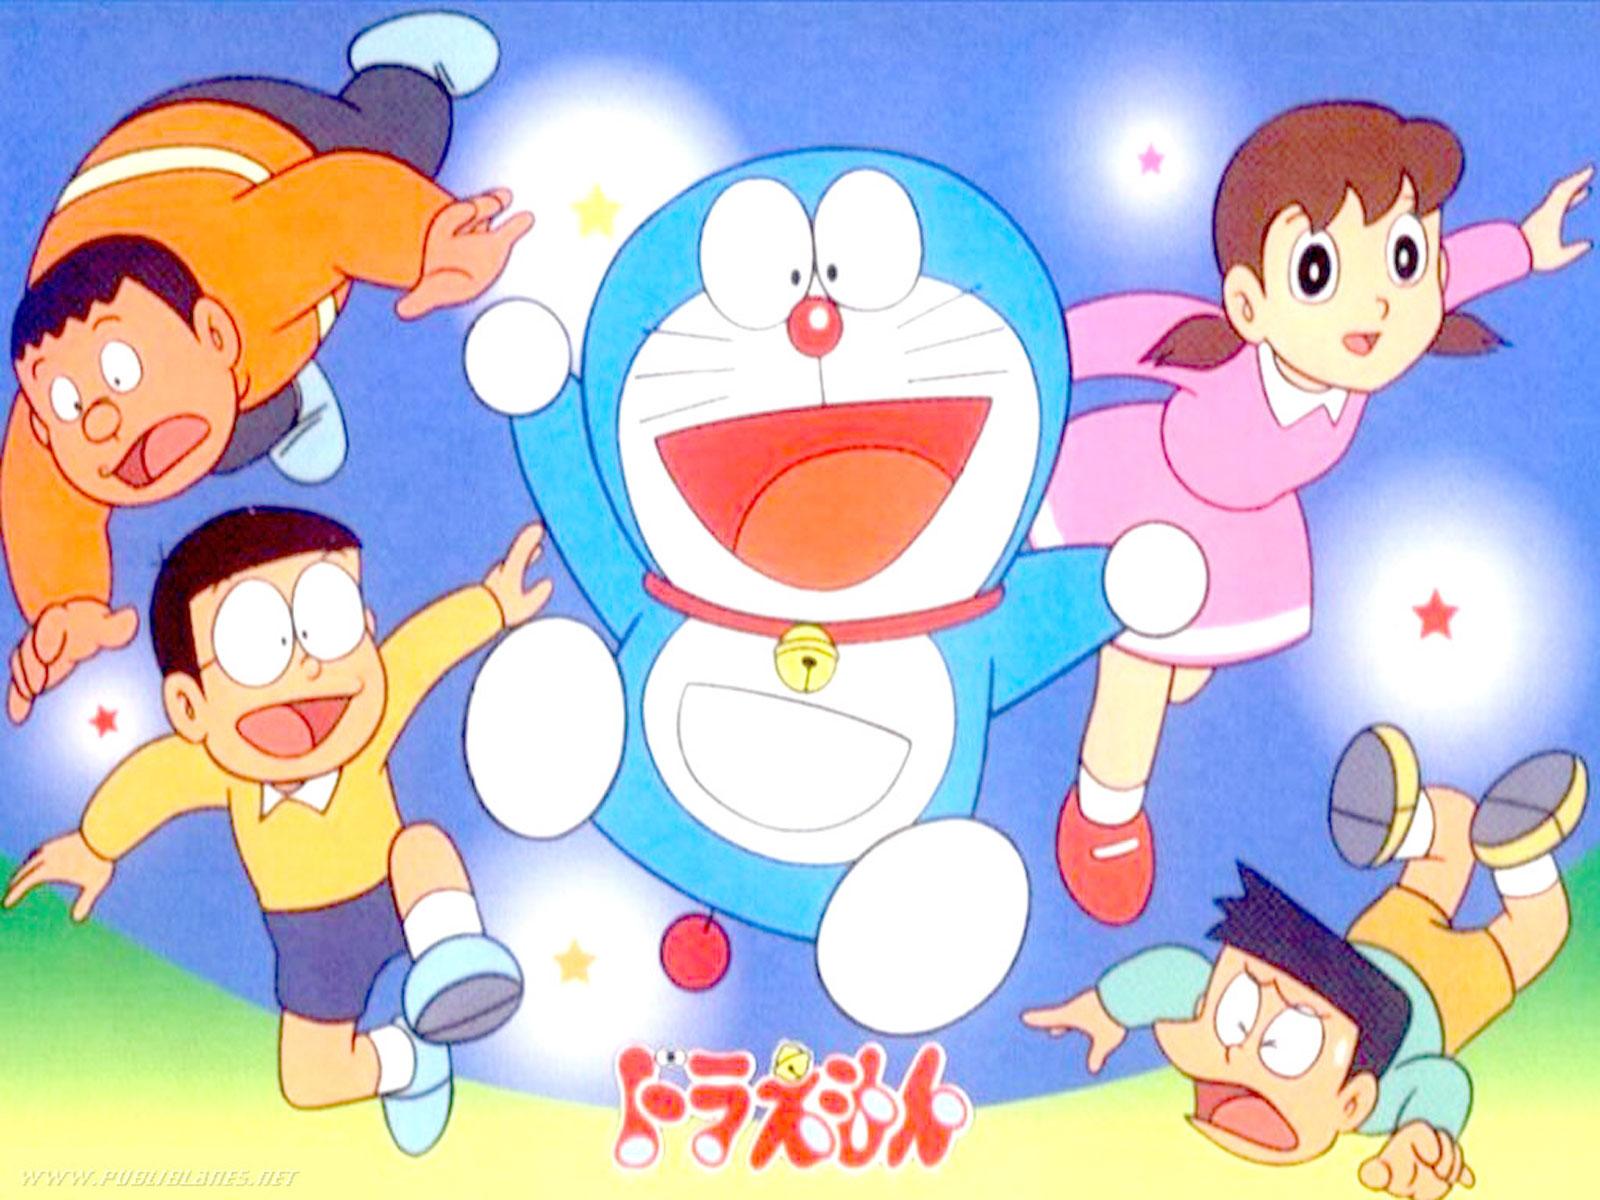 Doraemon 3D Wallpaper   Wallpapers HD Fine 1600x1200